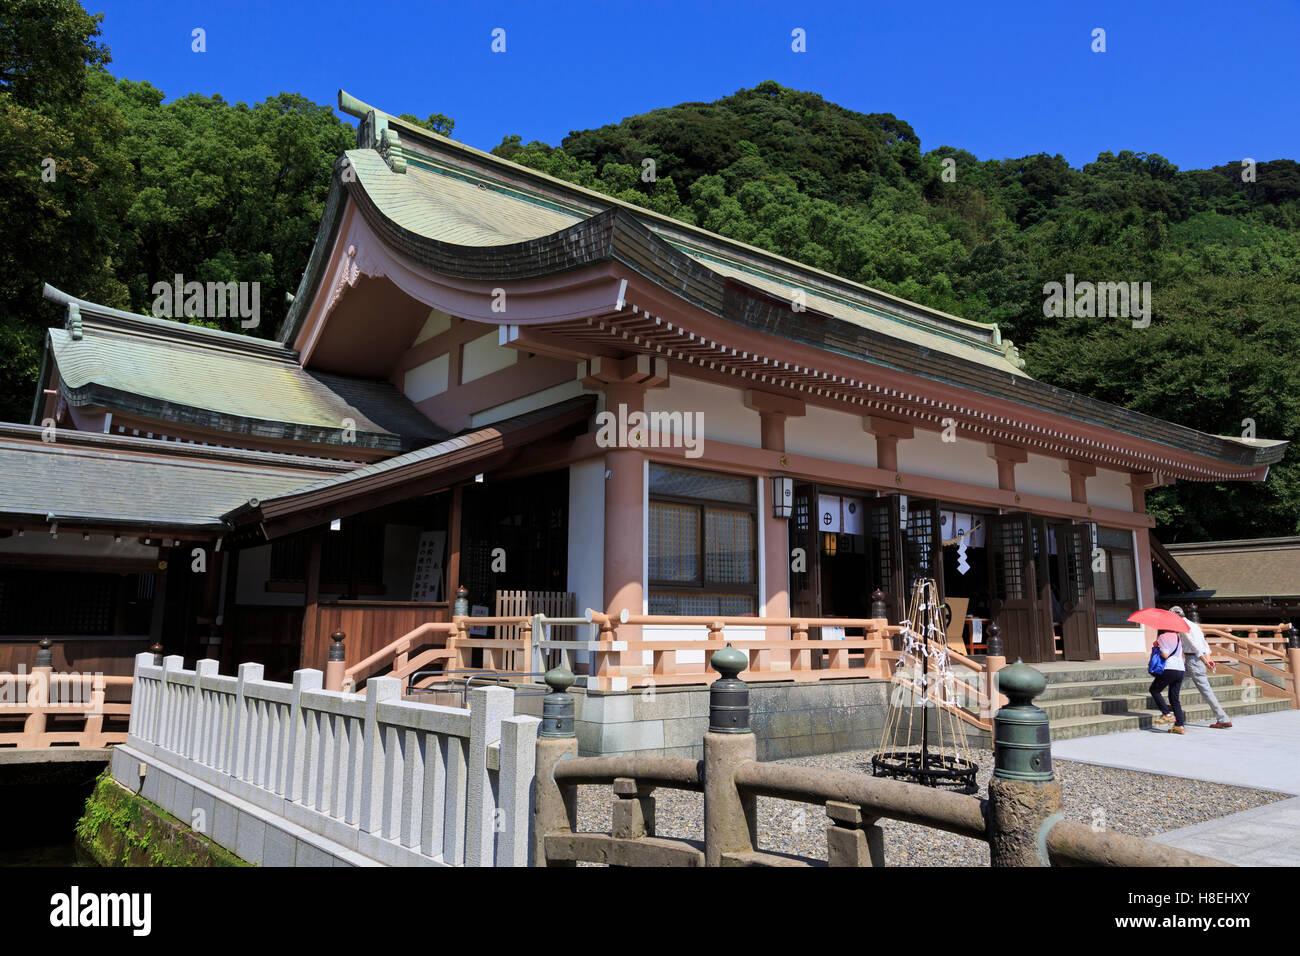 Terukuni Shrine, Kagoshima City, Kyushu Island, Japan, Asia - Stock Image